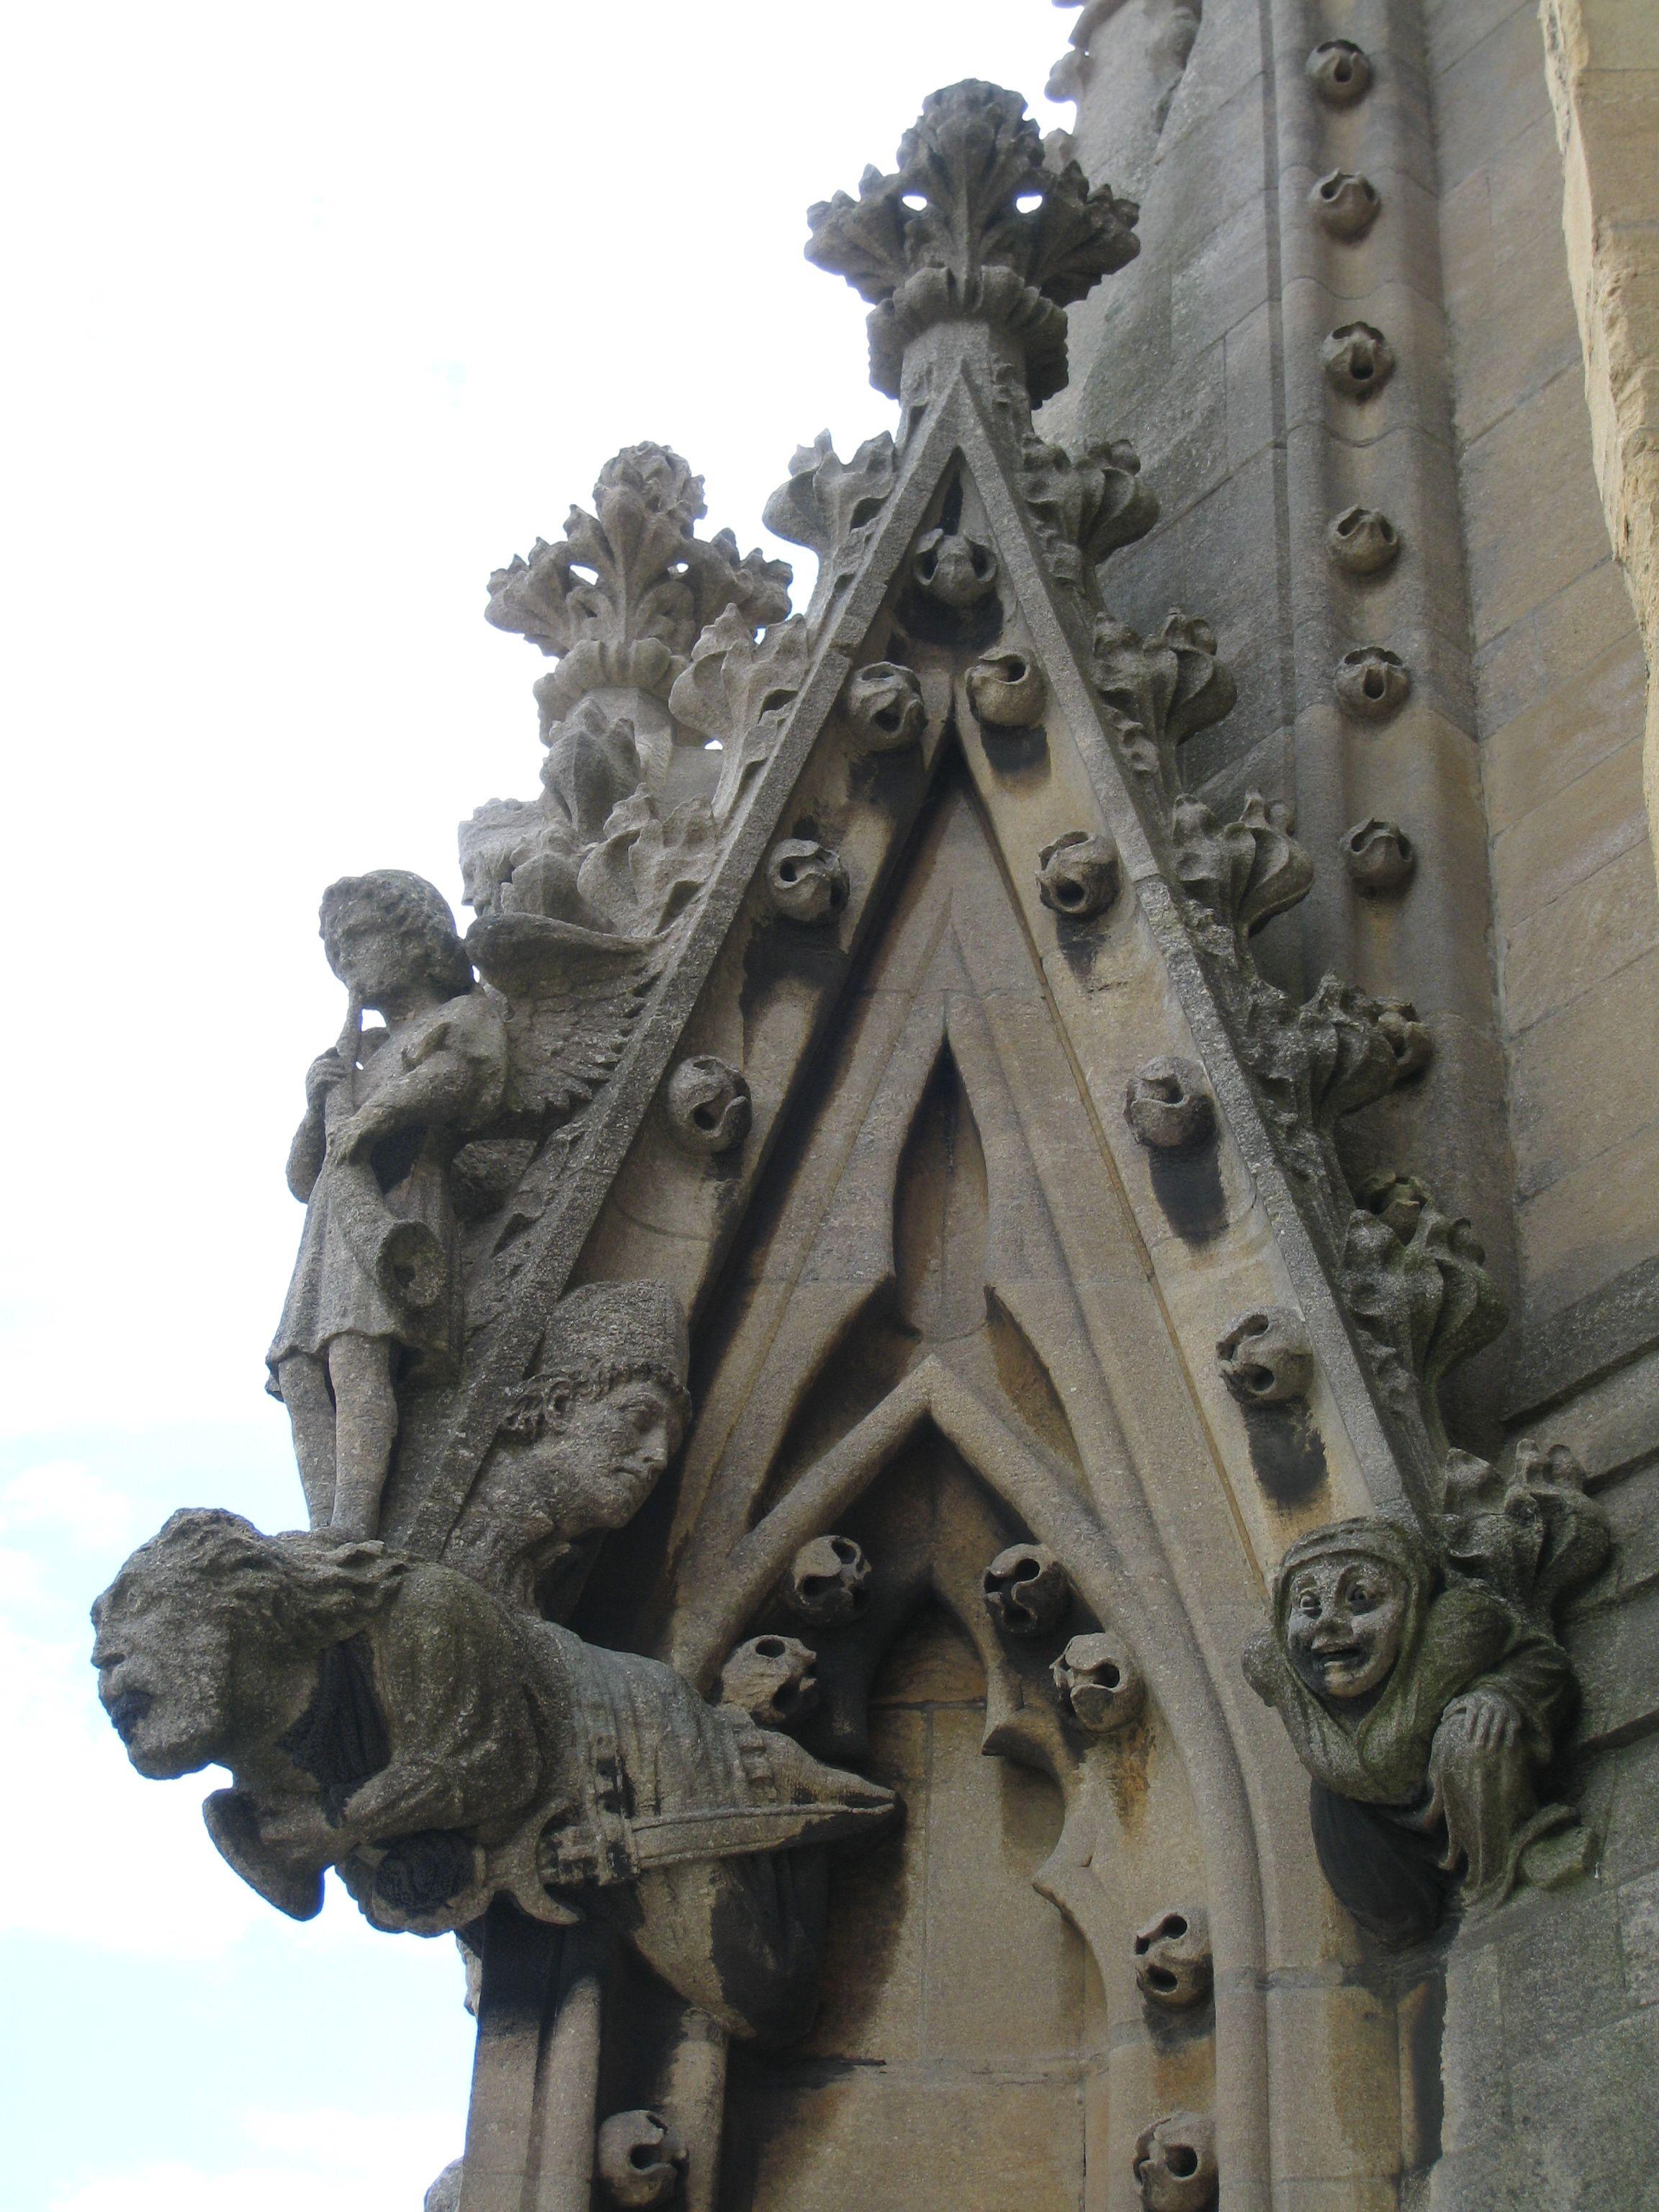 More gargoyles were added to ward away evil